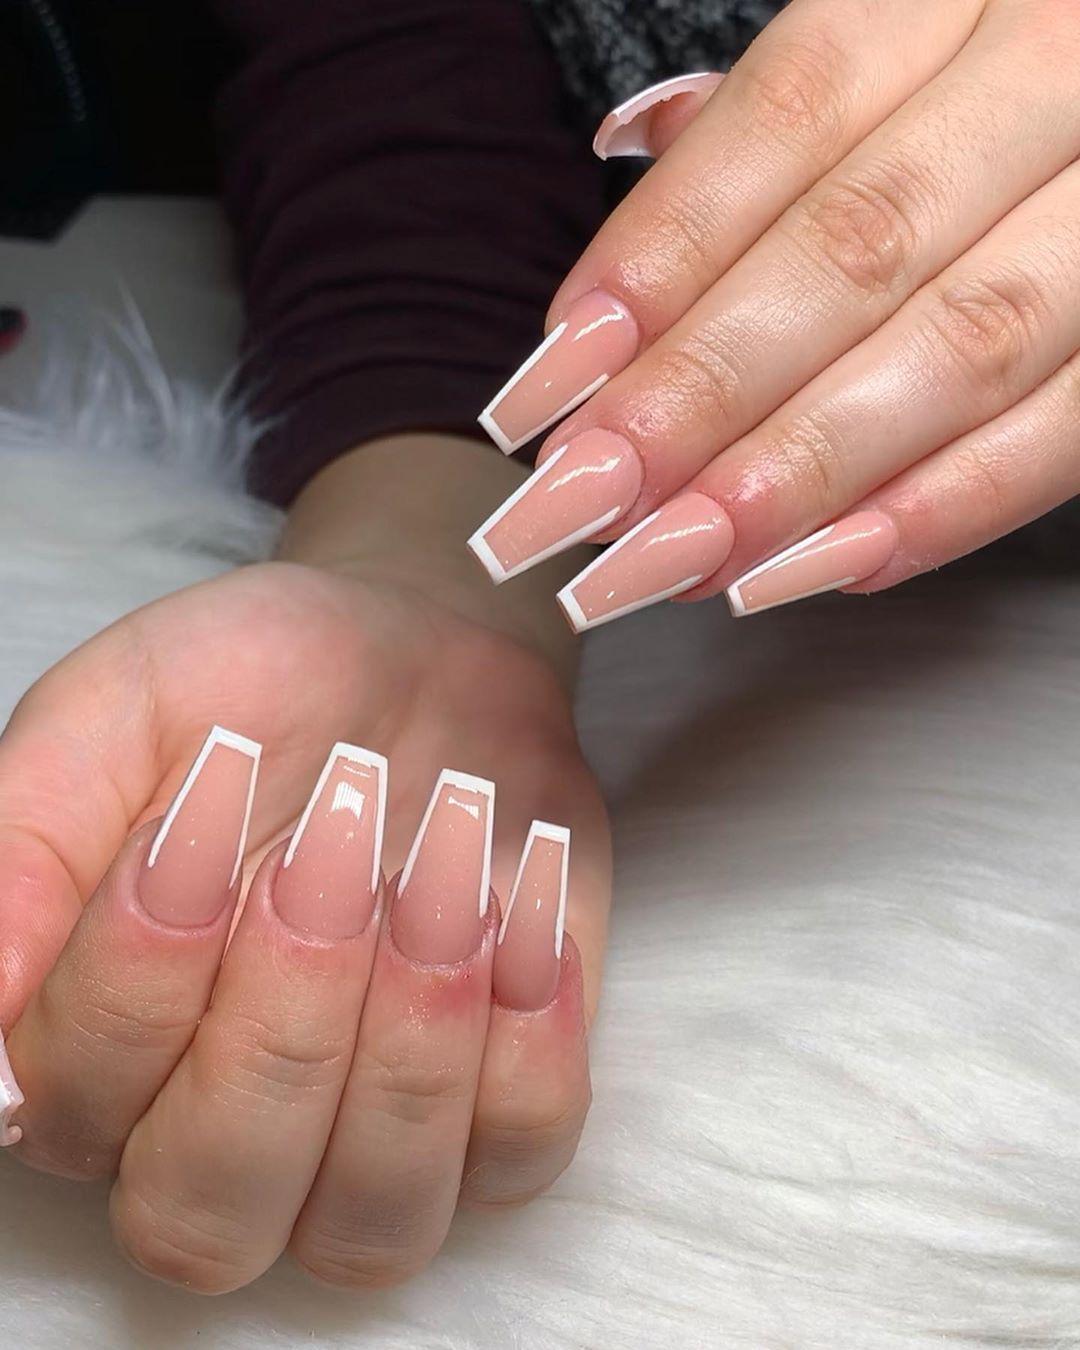 Outlined Nails Coffinnails Stilettonails Gelnails Gel Nailpolish Glassnails Rhinestonenails Nail Nails In 2020 White Tip Nails Sassy Nails Best Acrylic Nails